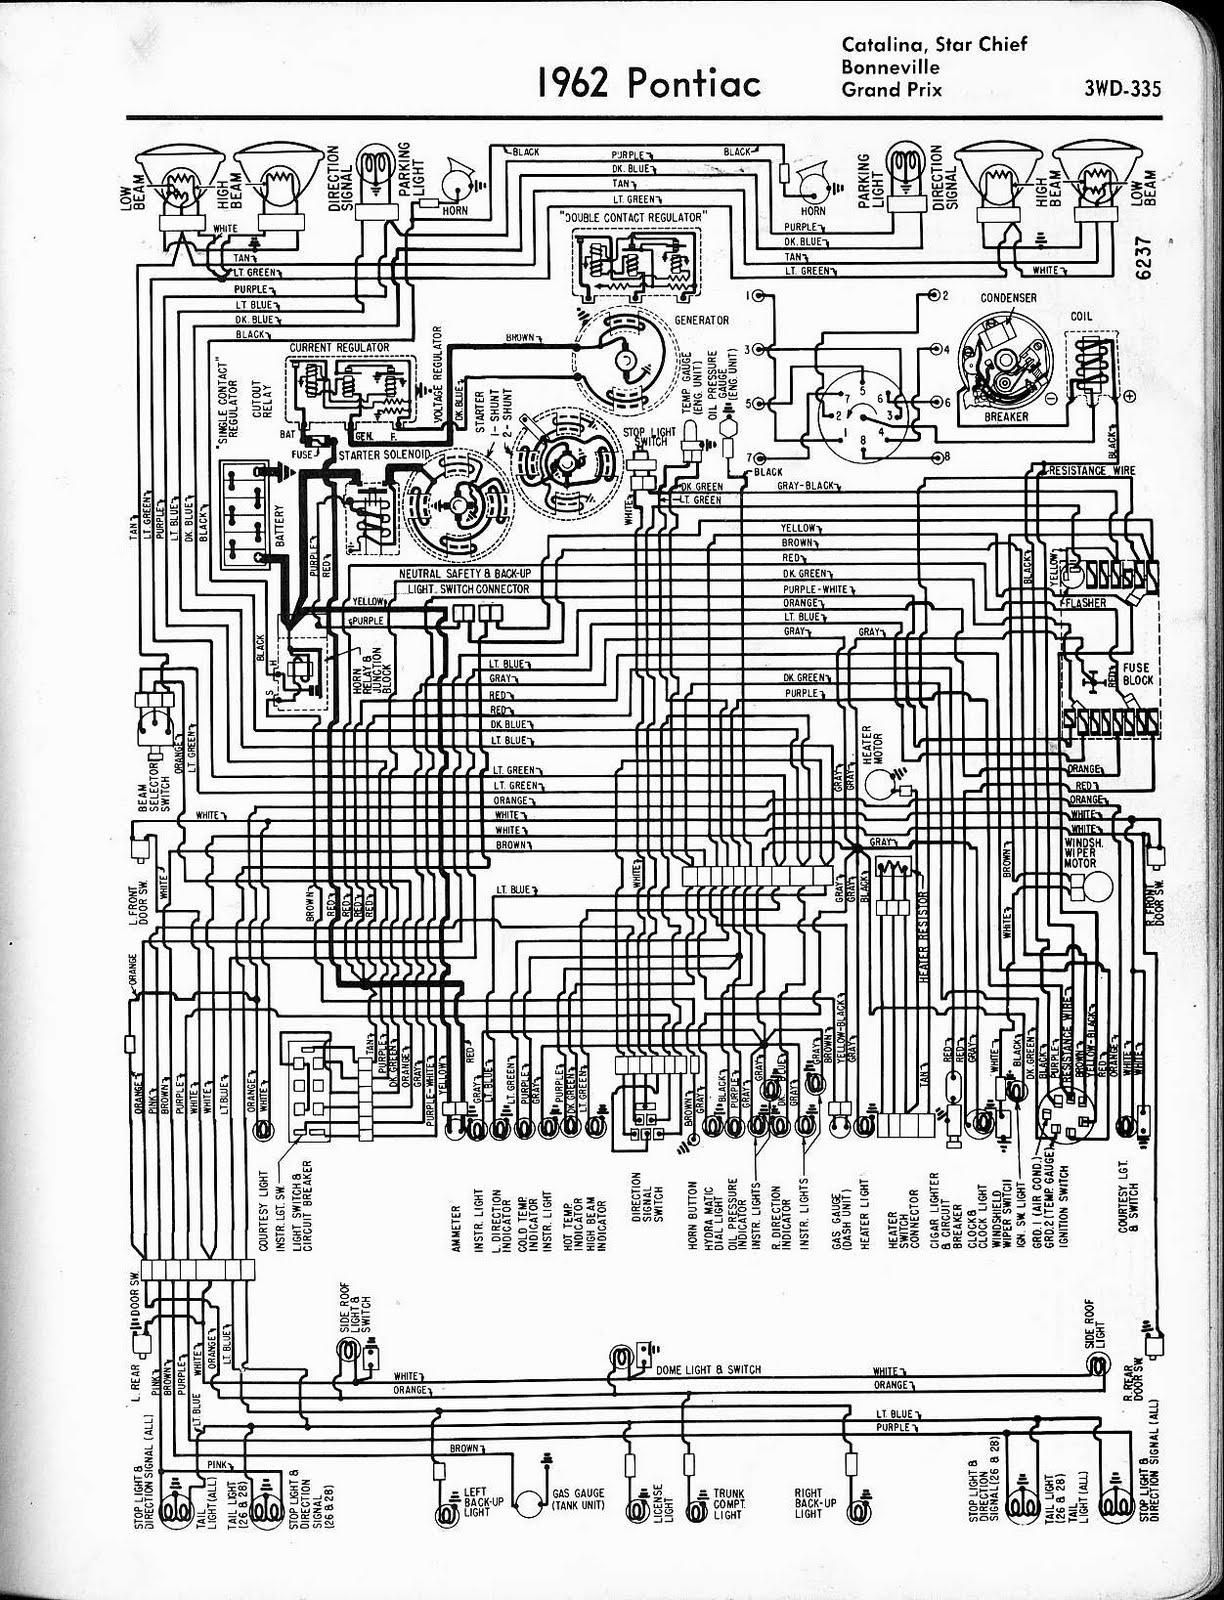 1977 Dodge Ignition Wiring Diagram Led Diagrams Free Auto Diagram: 1962 Pontiac Catalina, Star Chief, Bonneville, Grand Prix